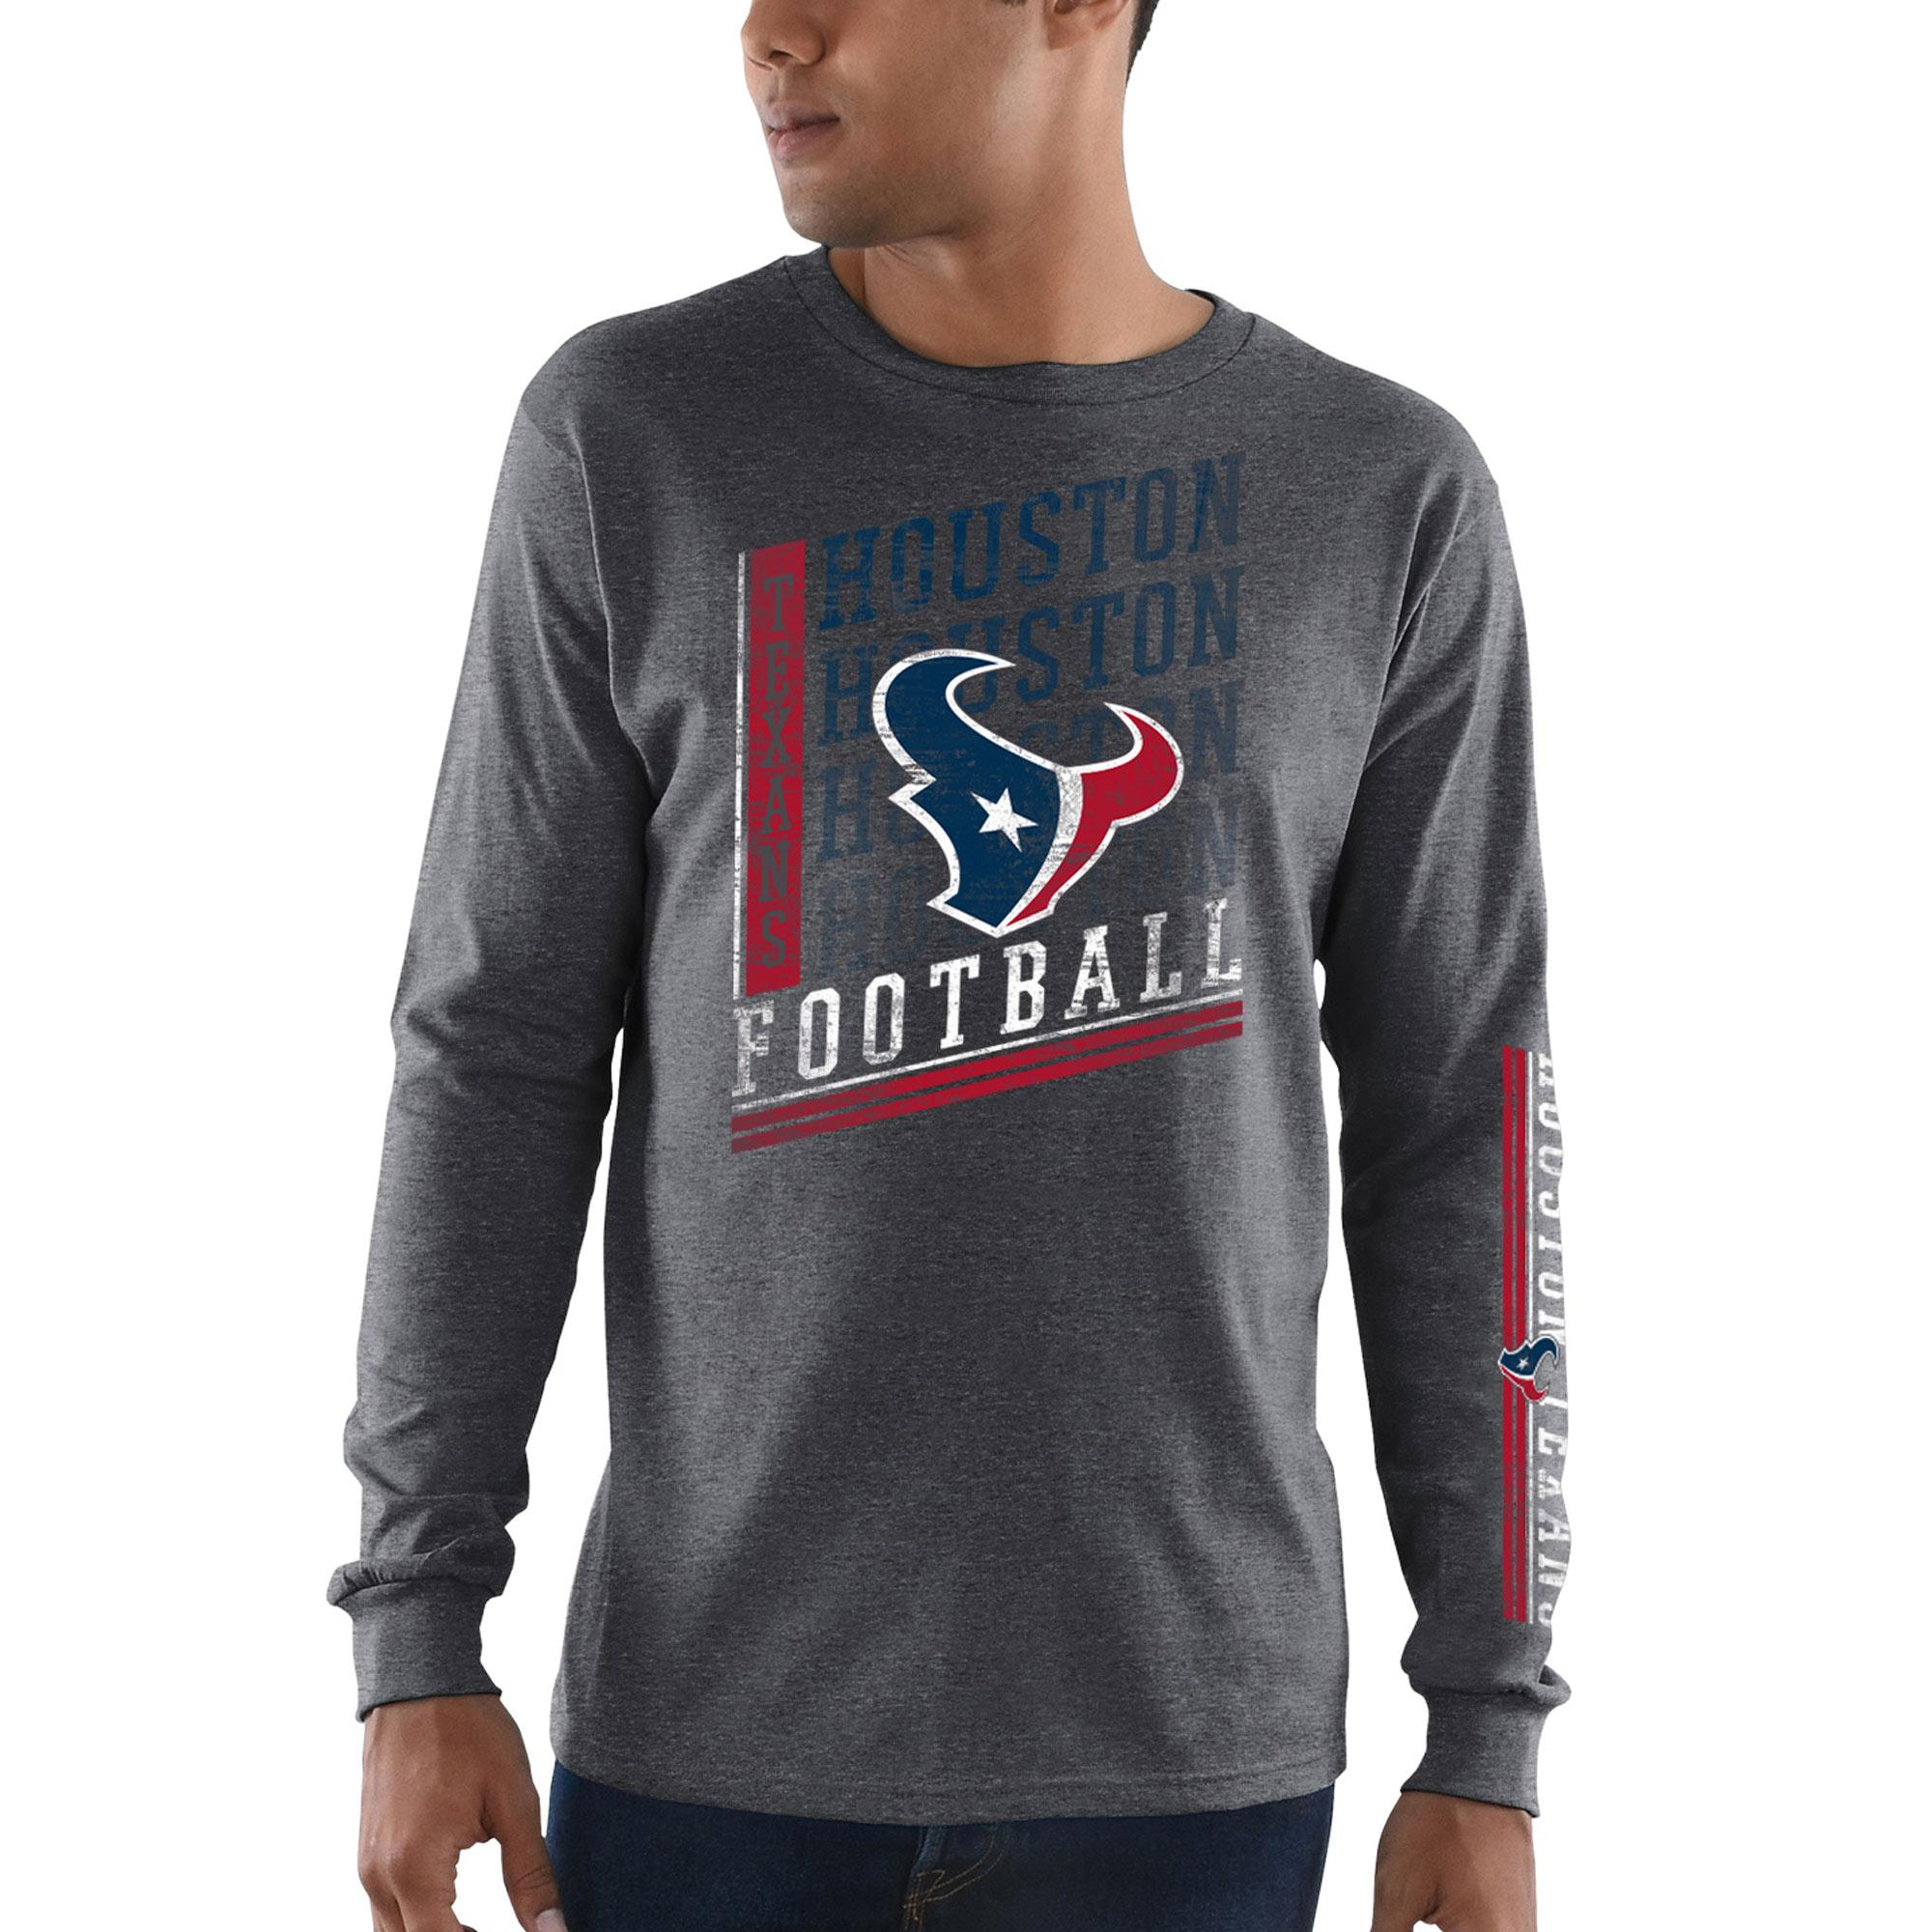 Houston Texans Majestic Dual Threat Long Sleeve T-Shirt - Heathered Charcoal